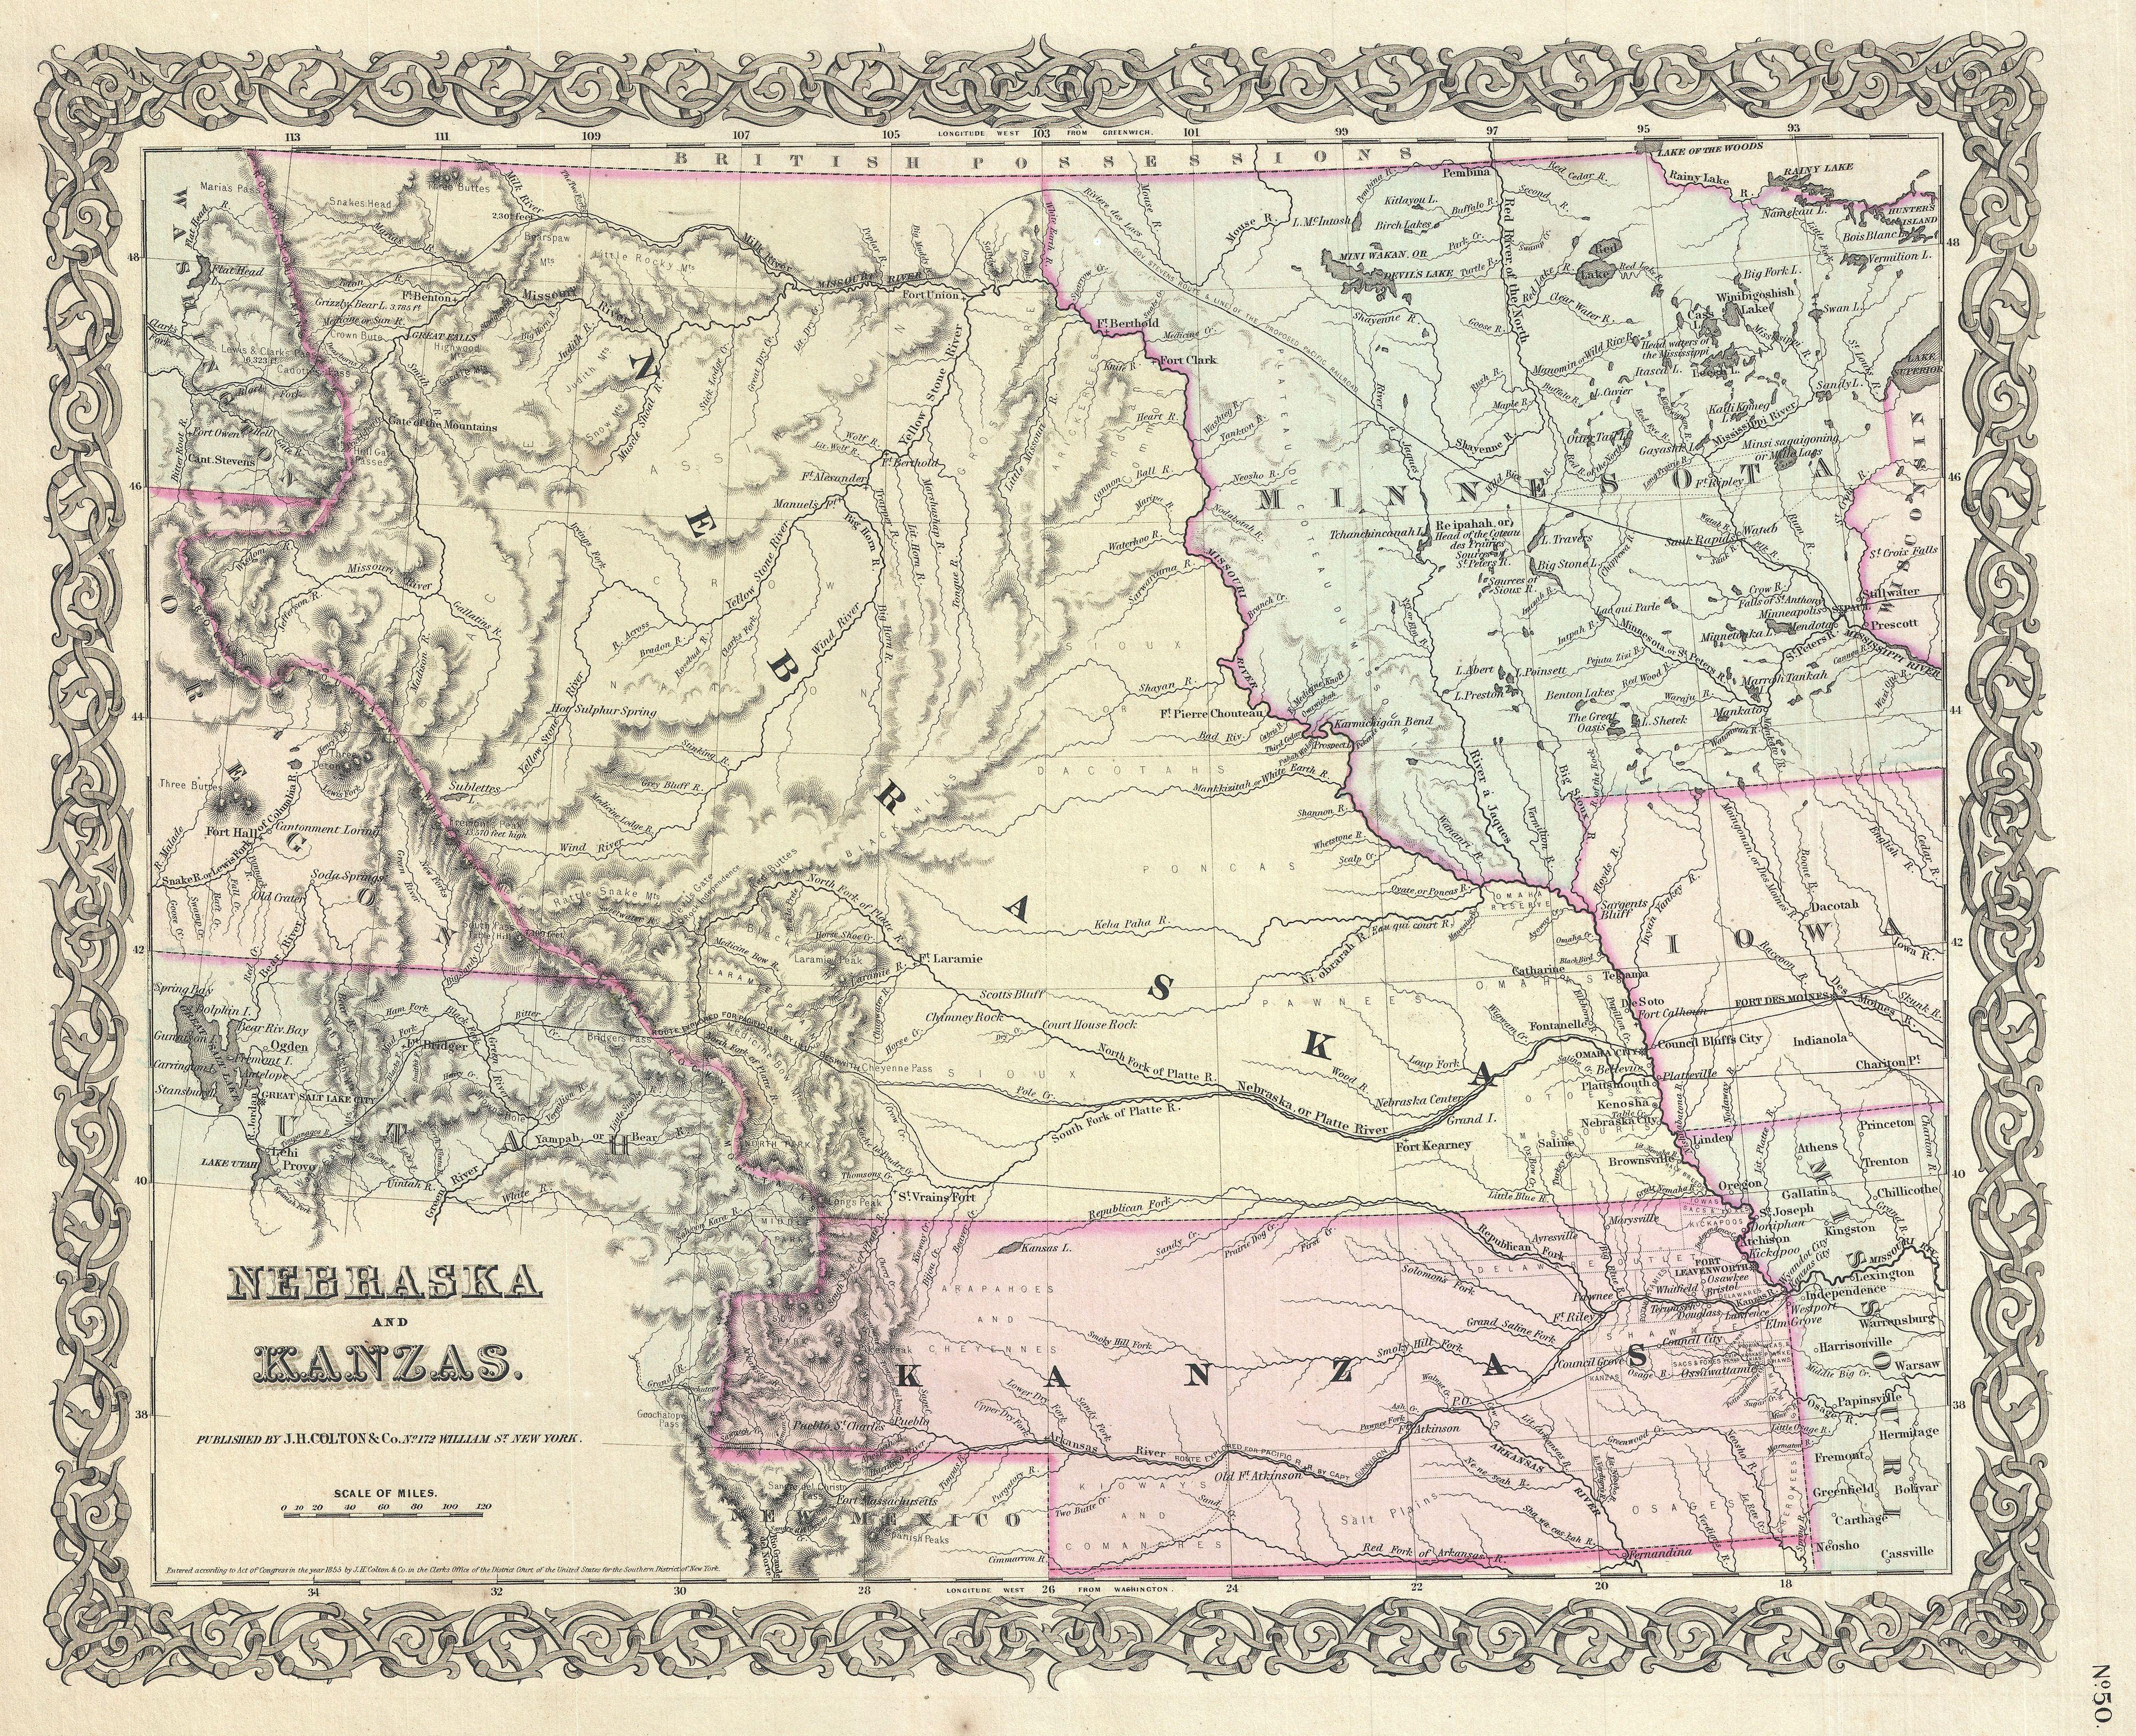 map of nebraska and kansas File 1855 Colton Map Of Kansas And Nebraska First Edition map of nebraska and kansas